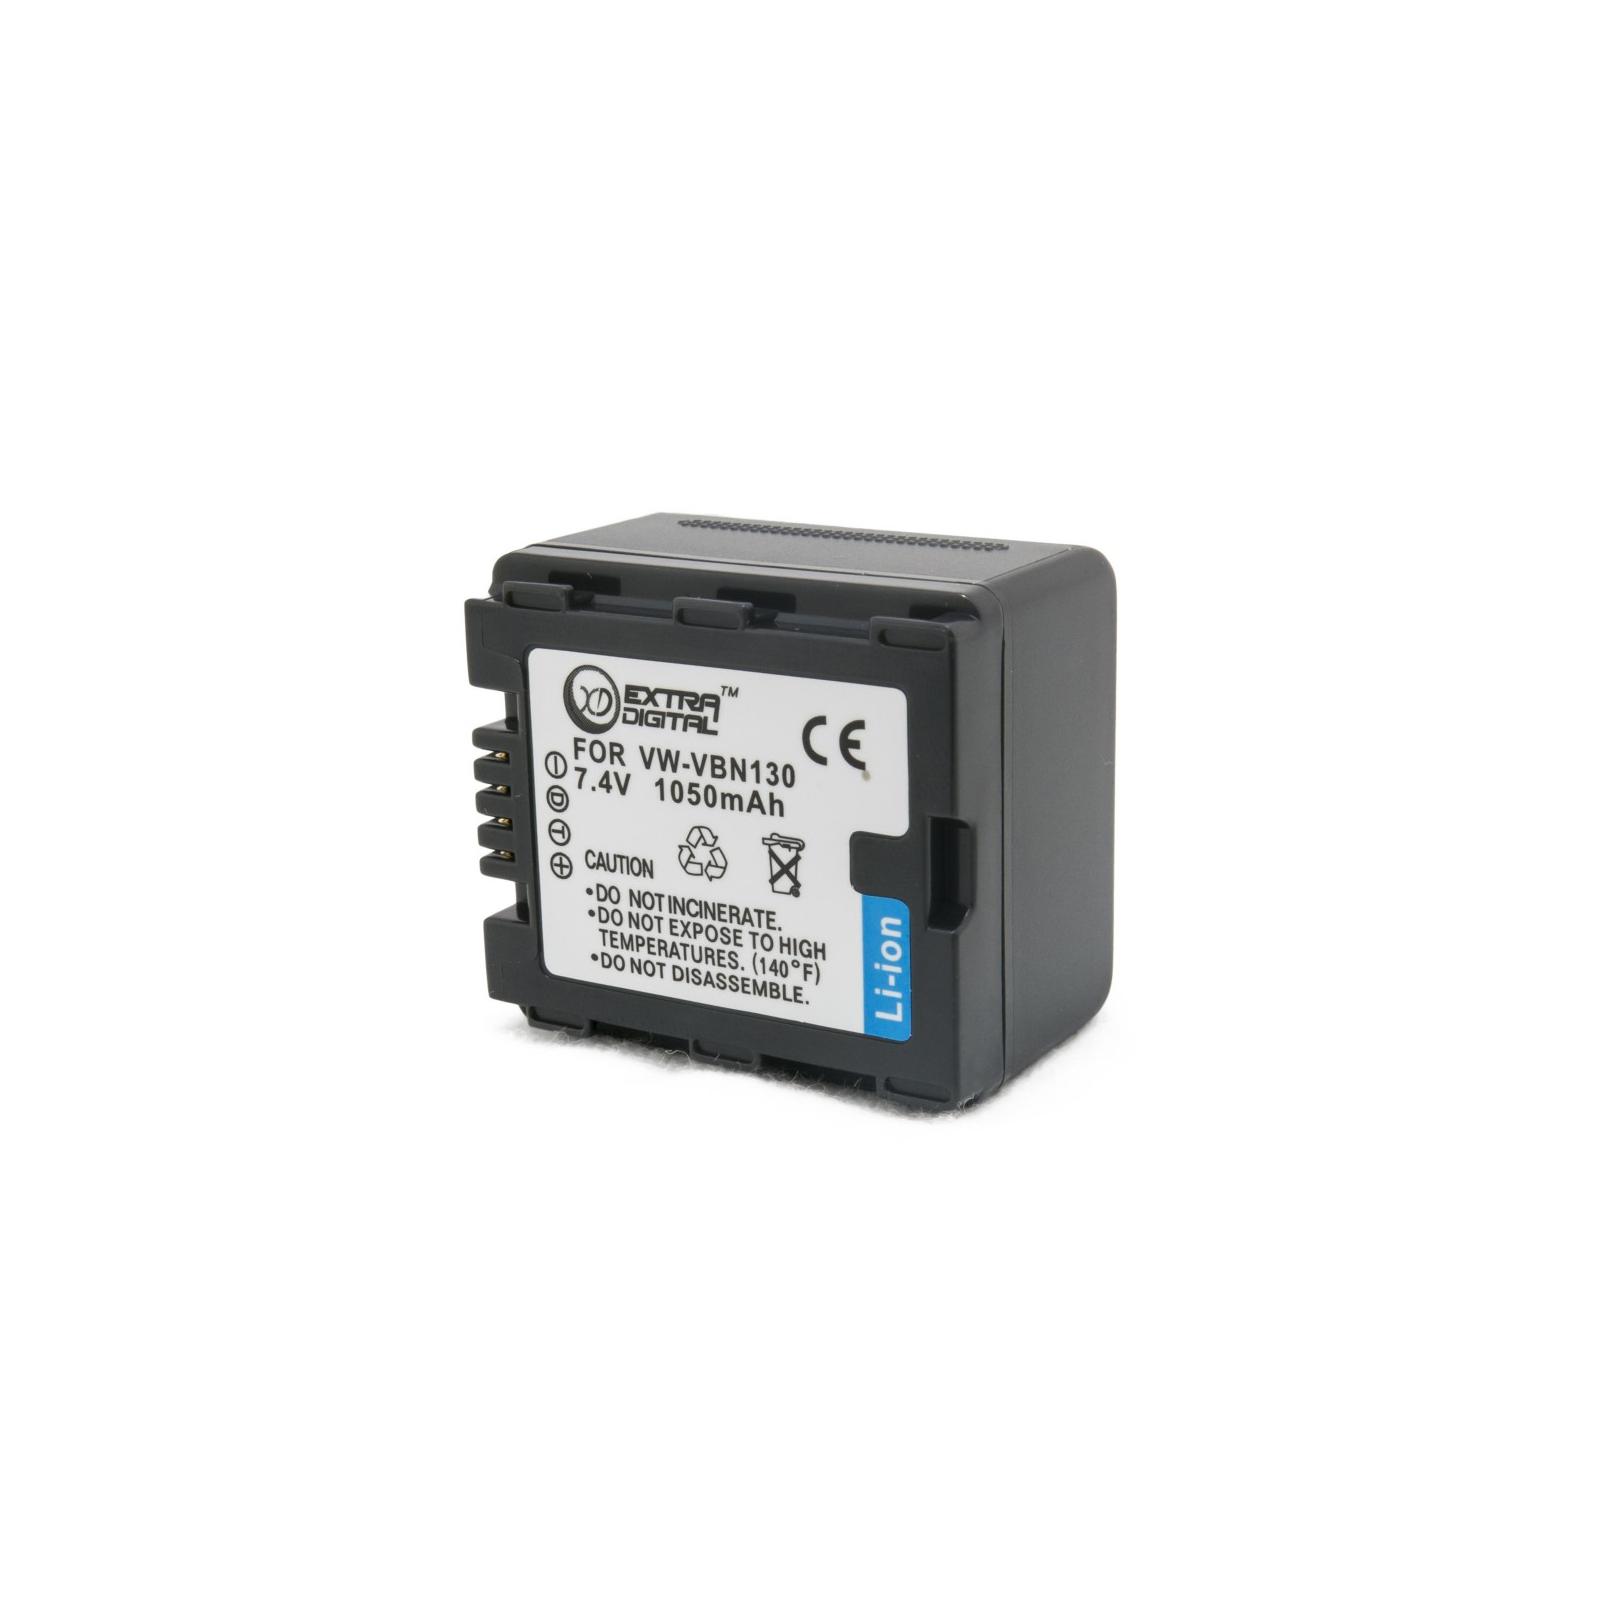 Аккумулятор к фото/видео EXTRADIGITAL Panasonic VW-VBN130 (DV00DV1361) изображение 2